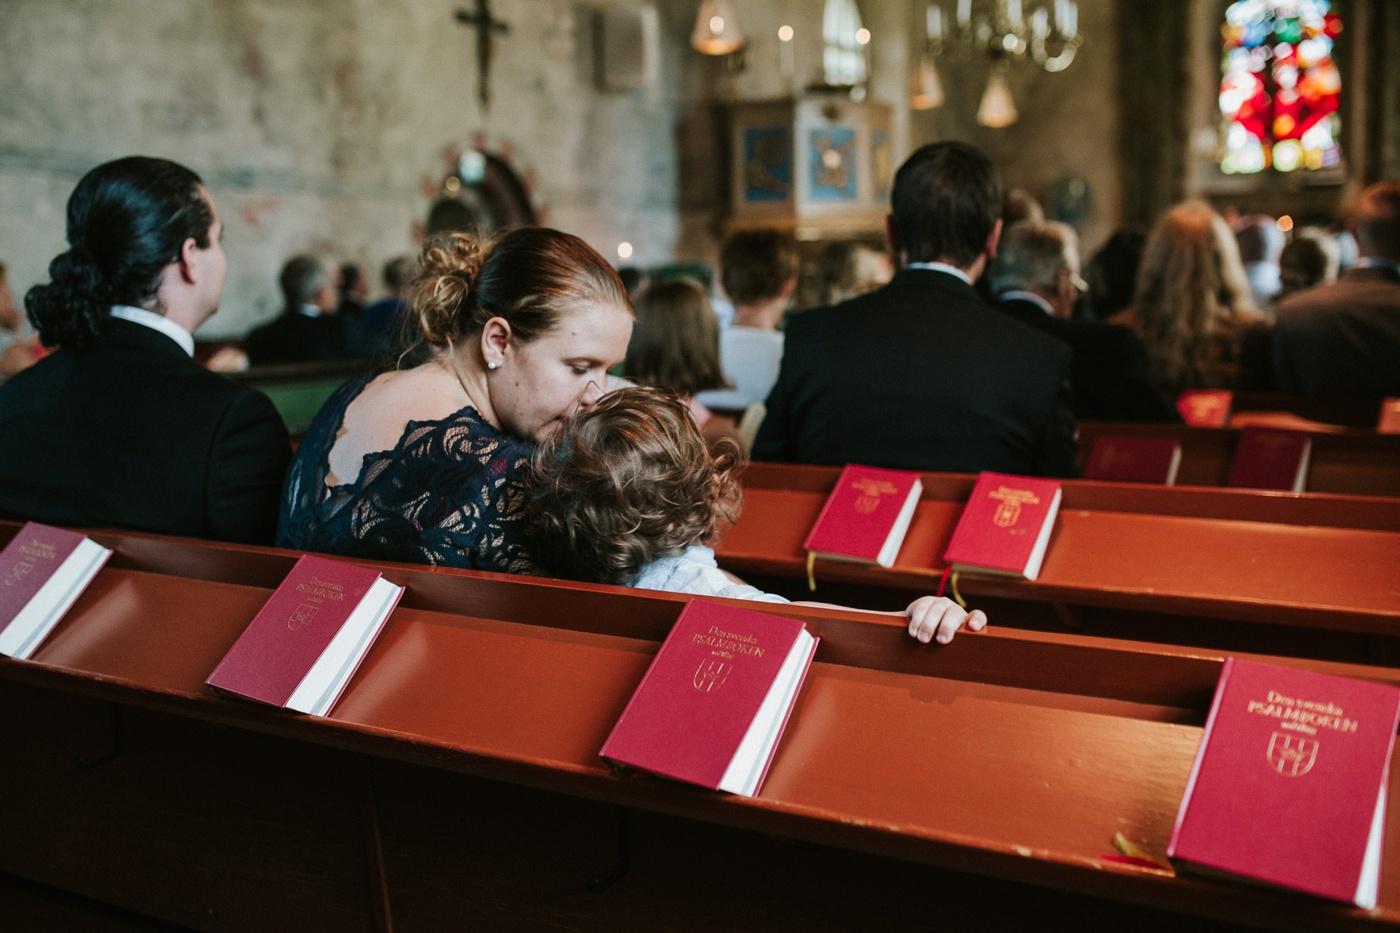 ceciliajoakim_sweden-countryside-summer-wedding_melbourne-fun-quirky-wedding-photography_19